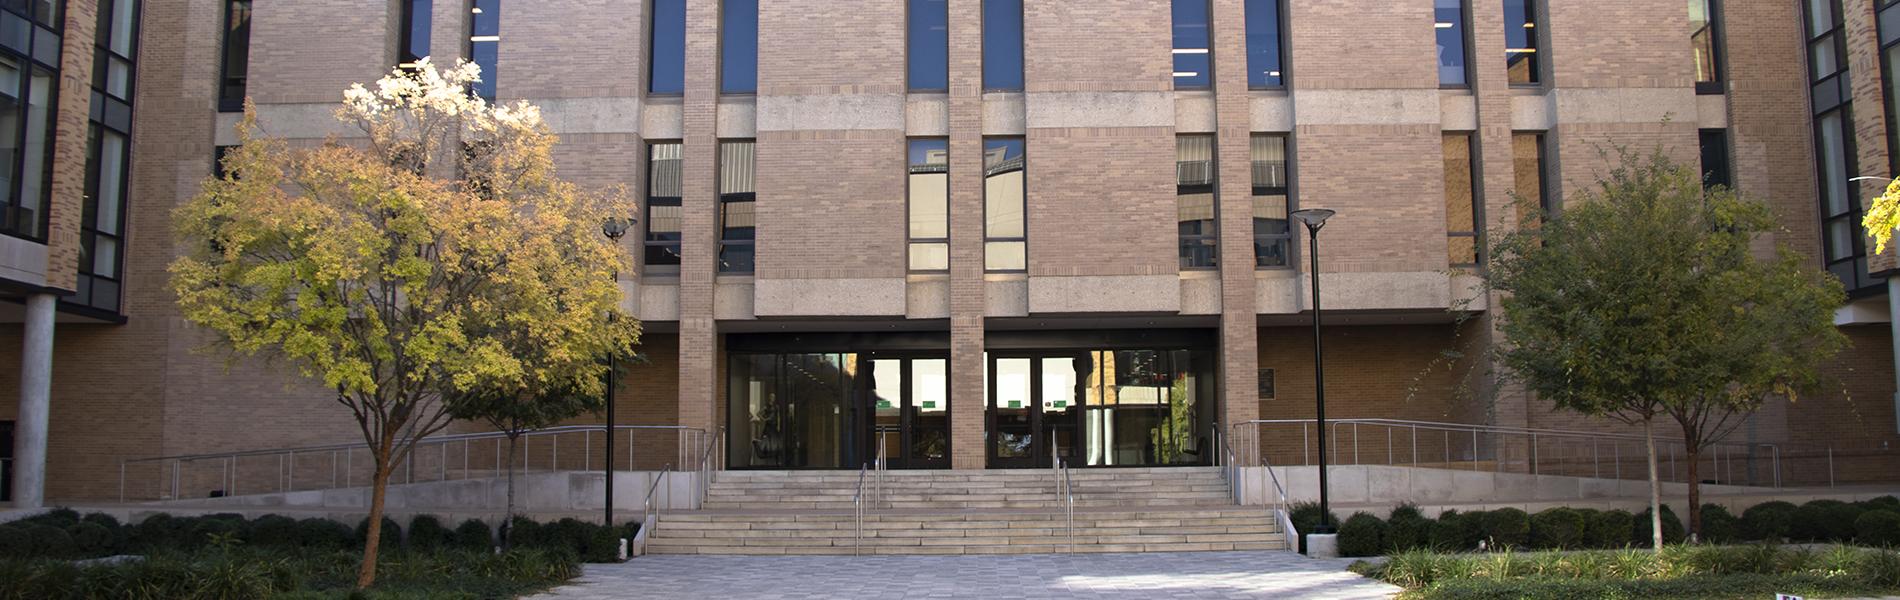 Art Building courtyard facing west